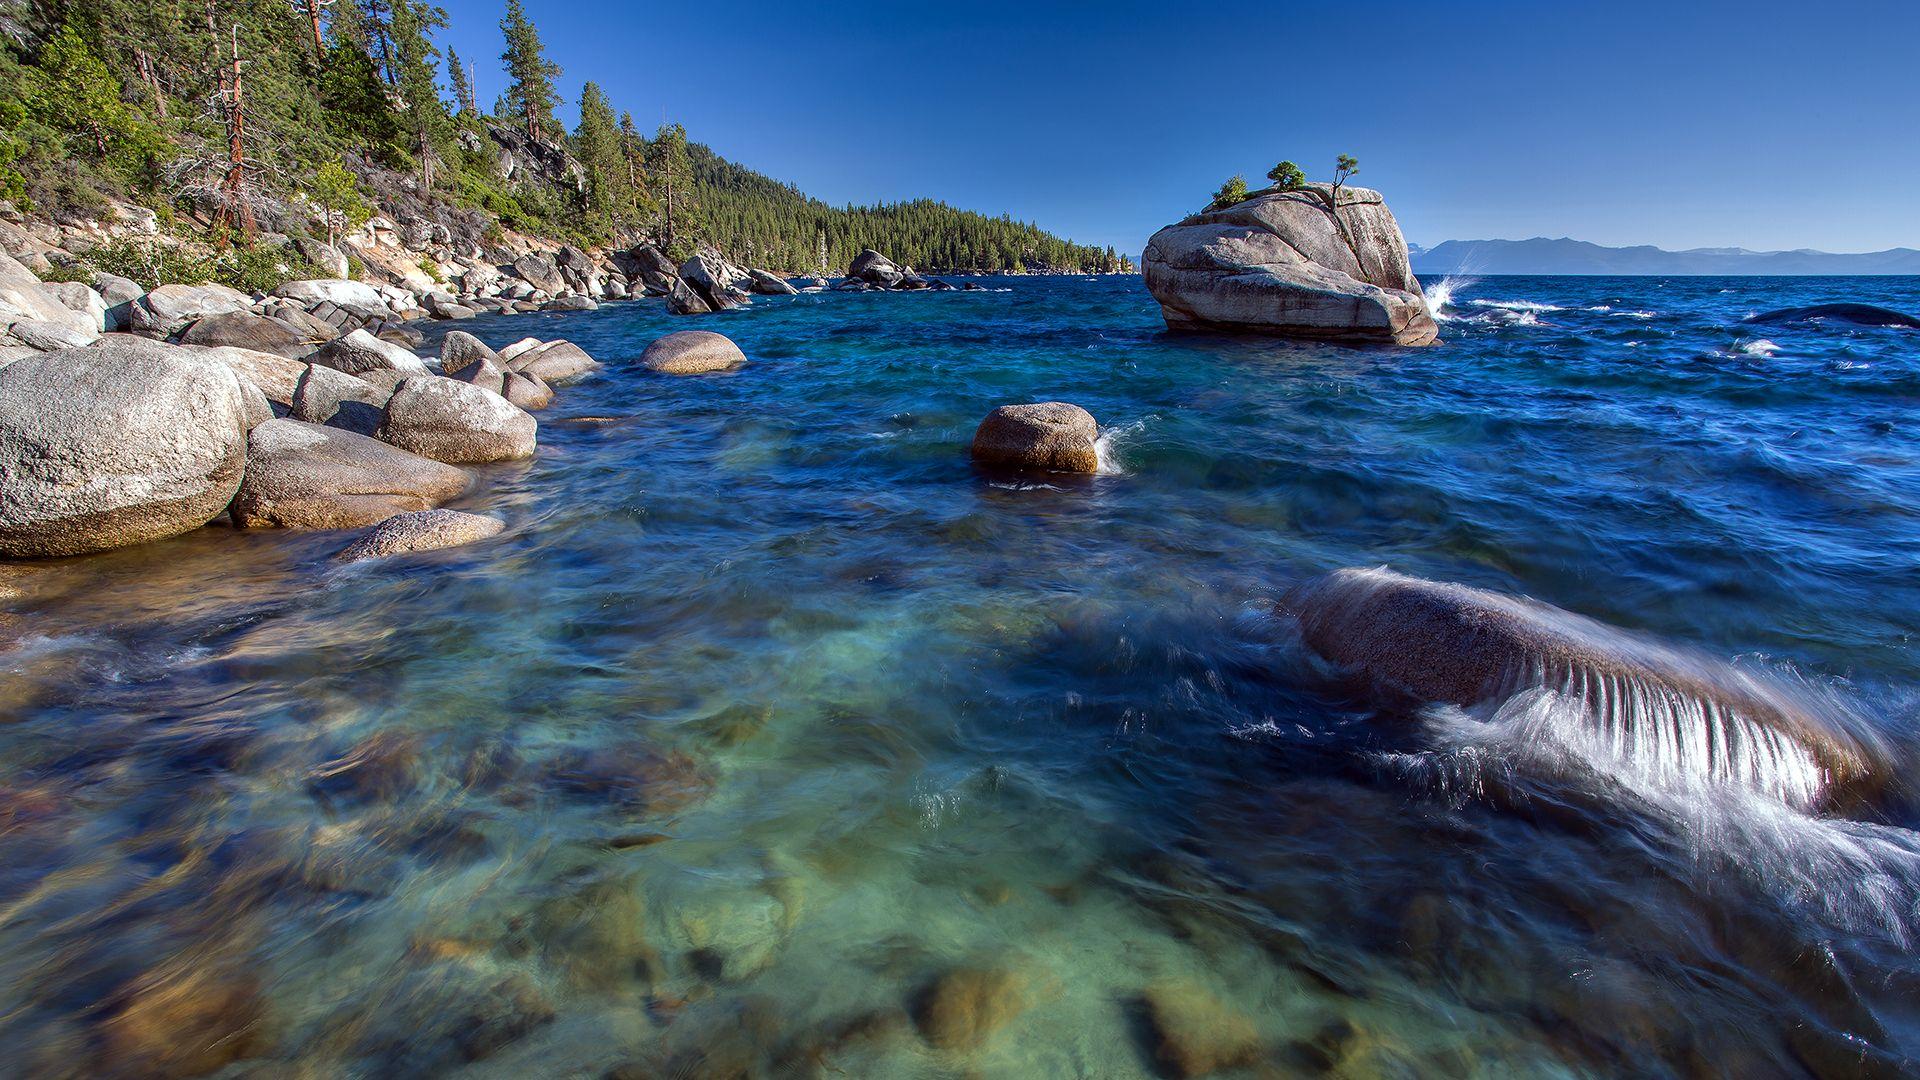 Lake Tahoe 2 Desktop Wallpaper 1920x1080 Landscape